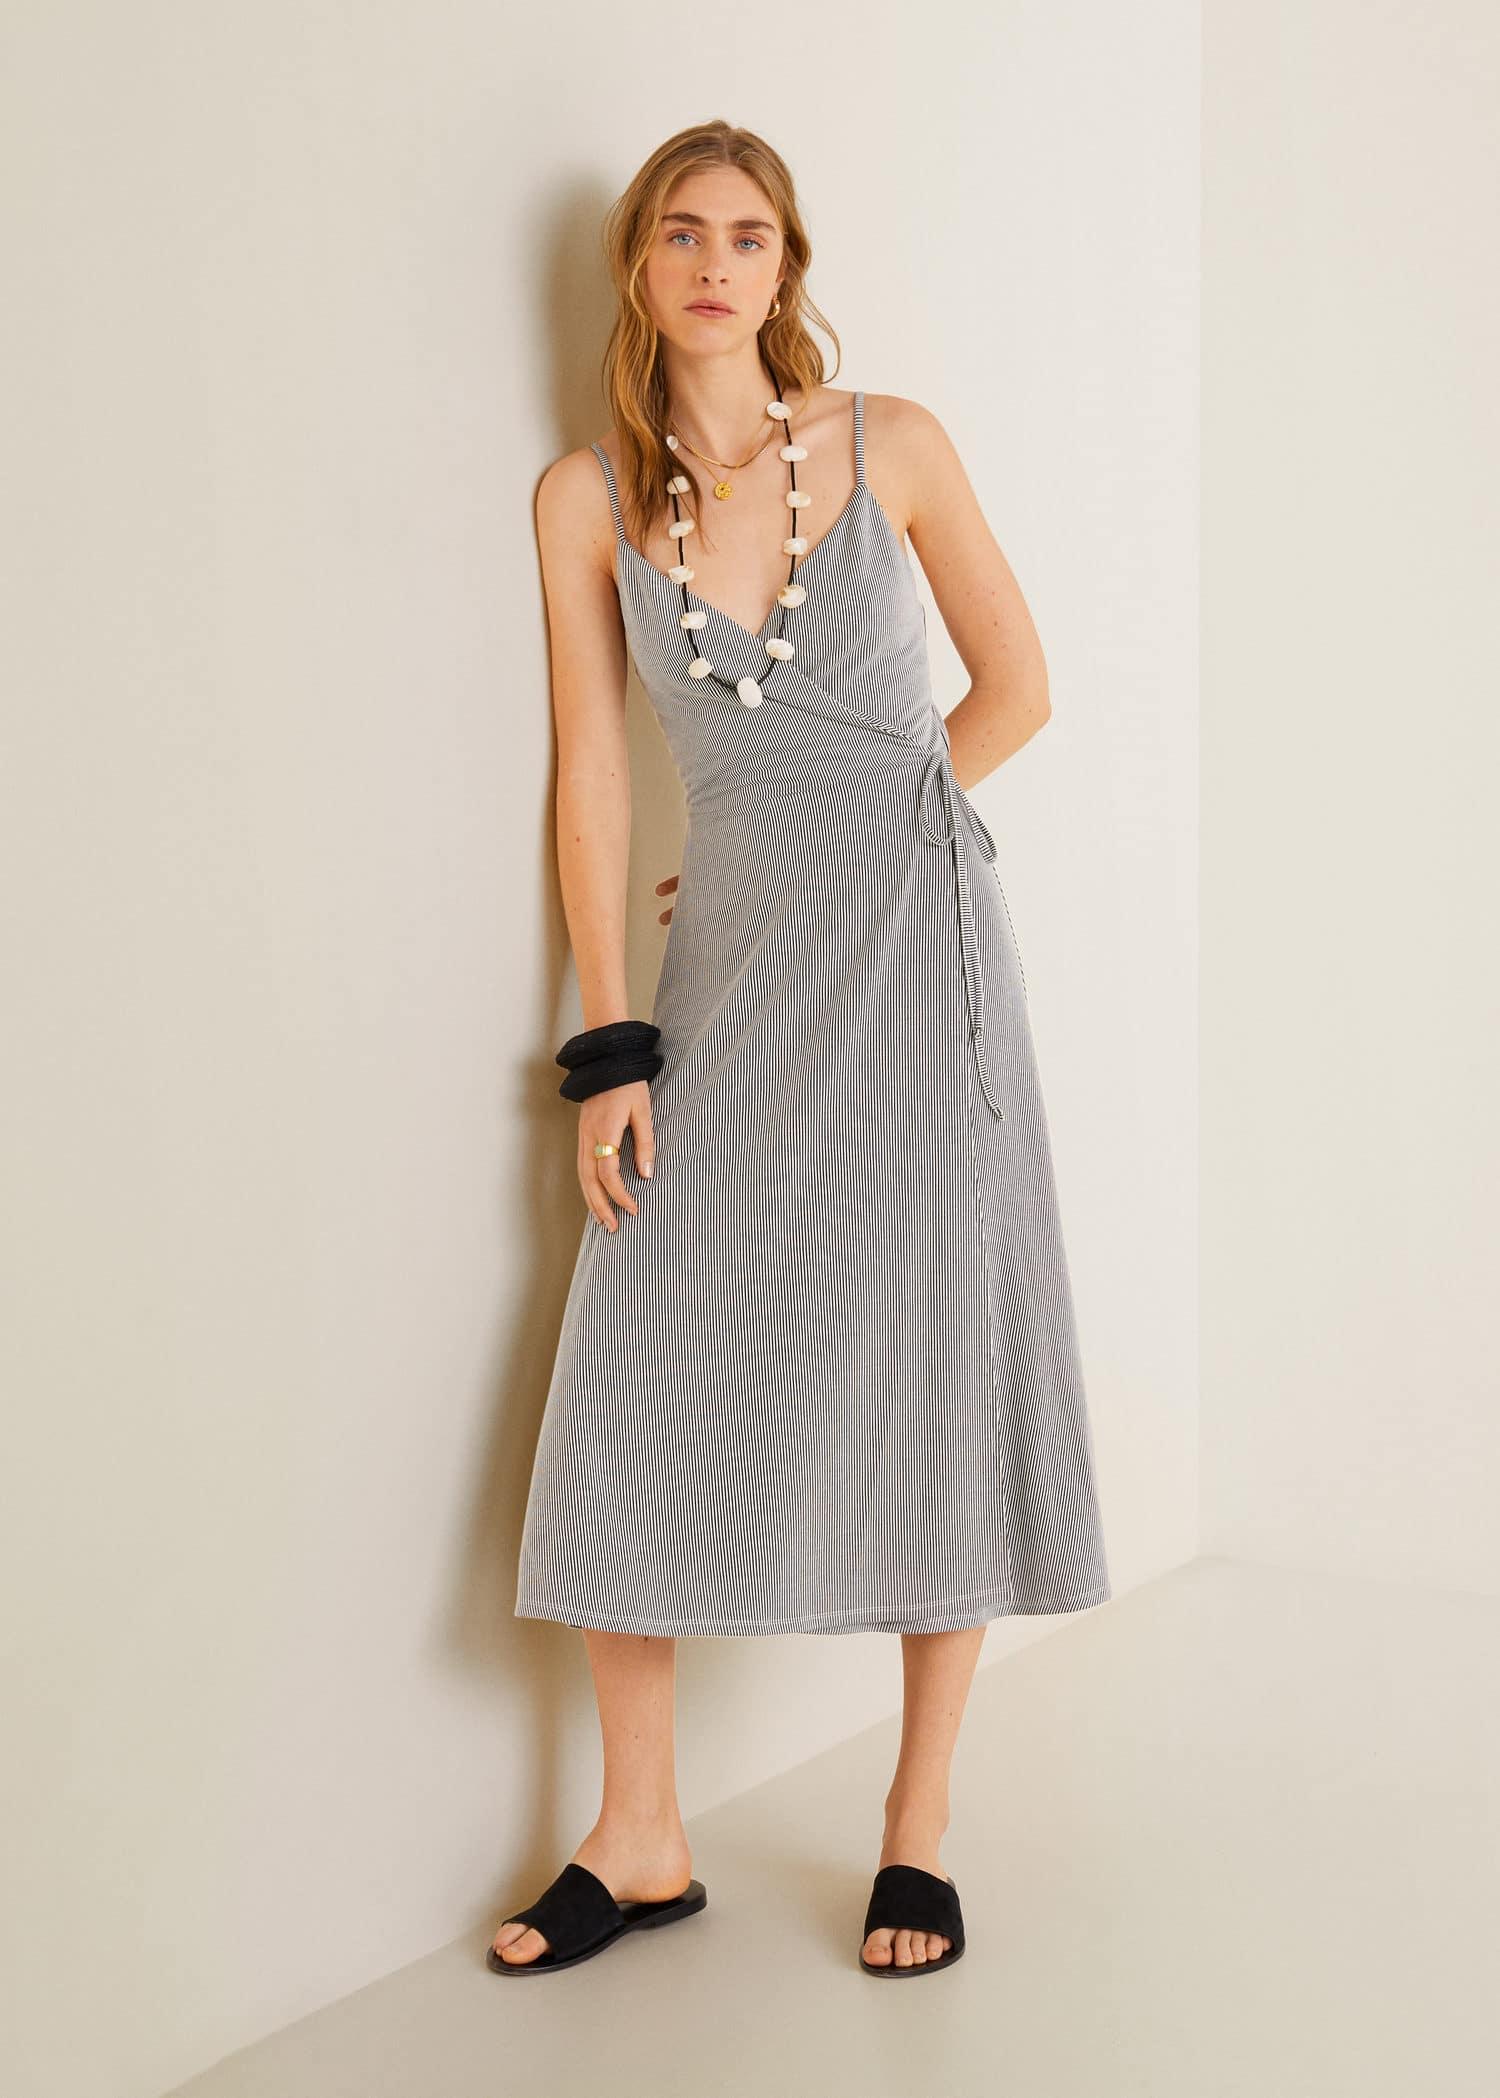 incredible outfit vestido blanco playa 8